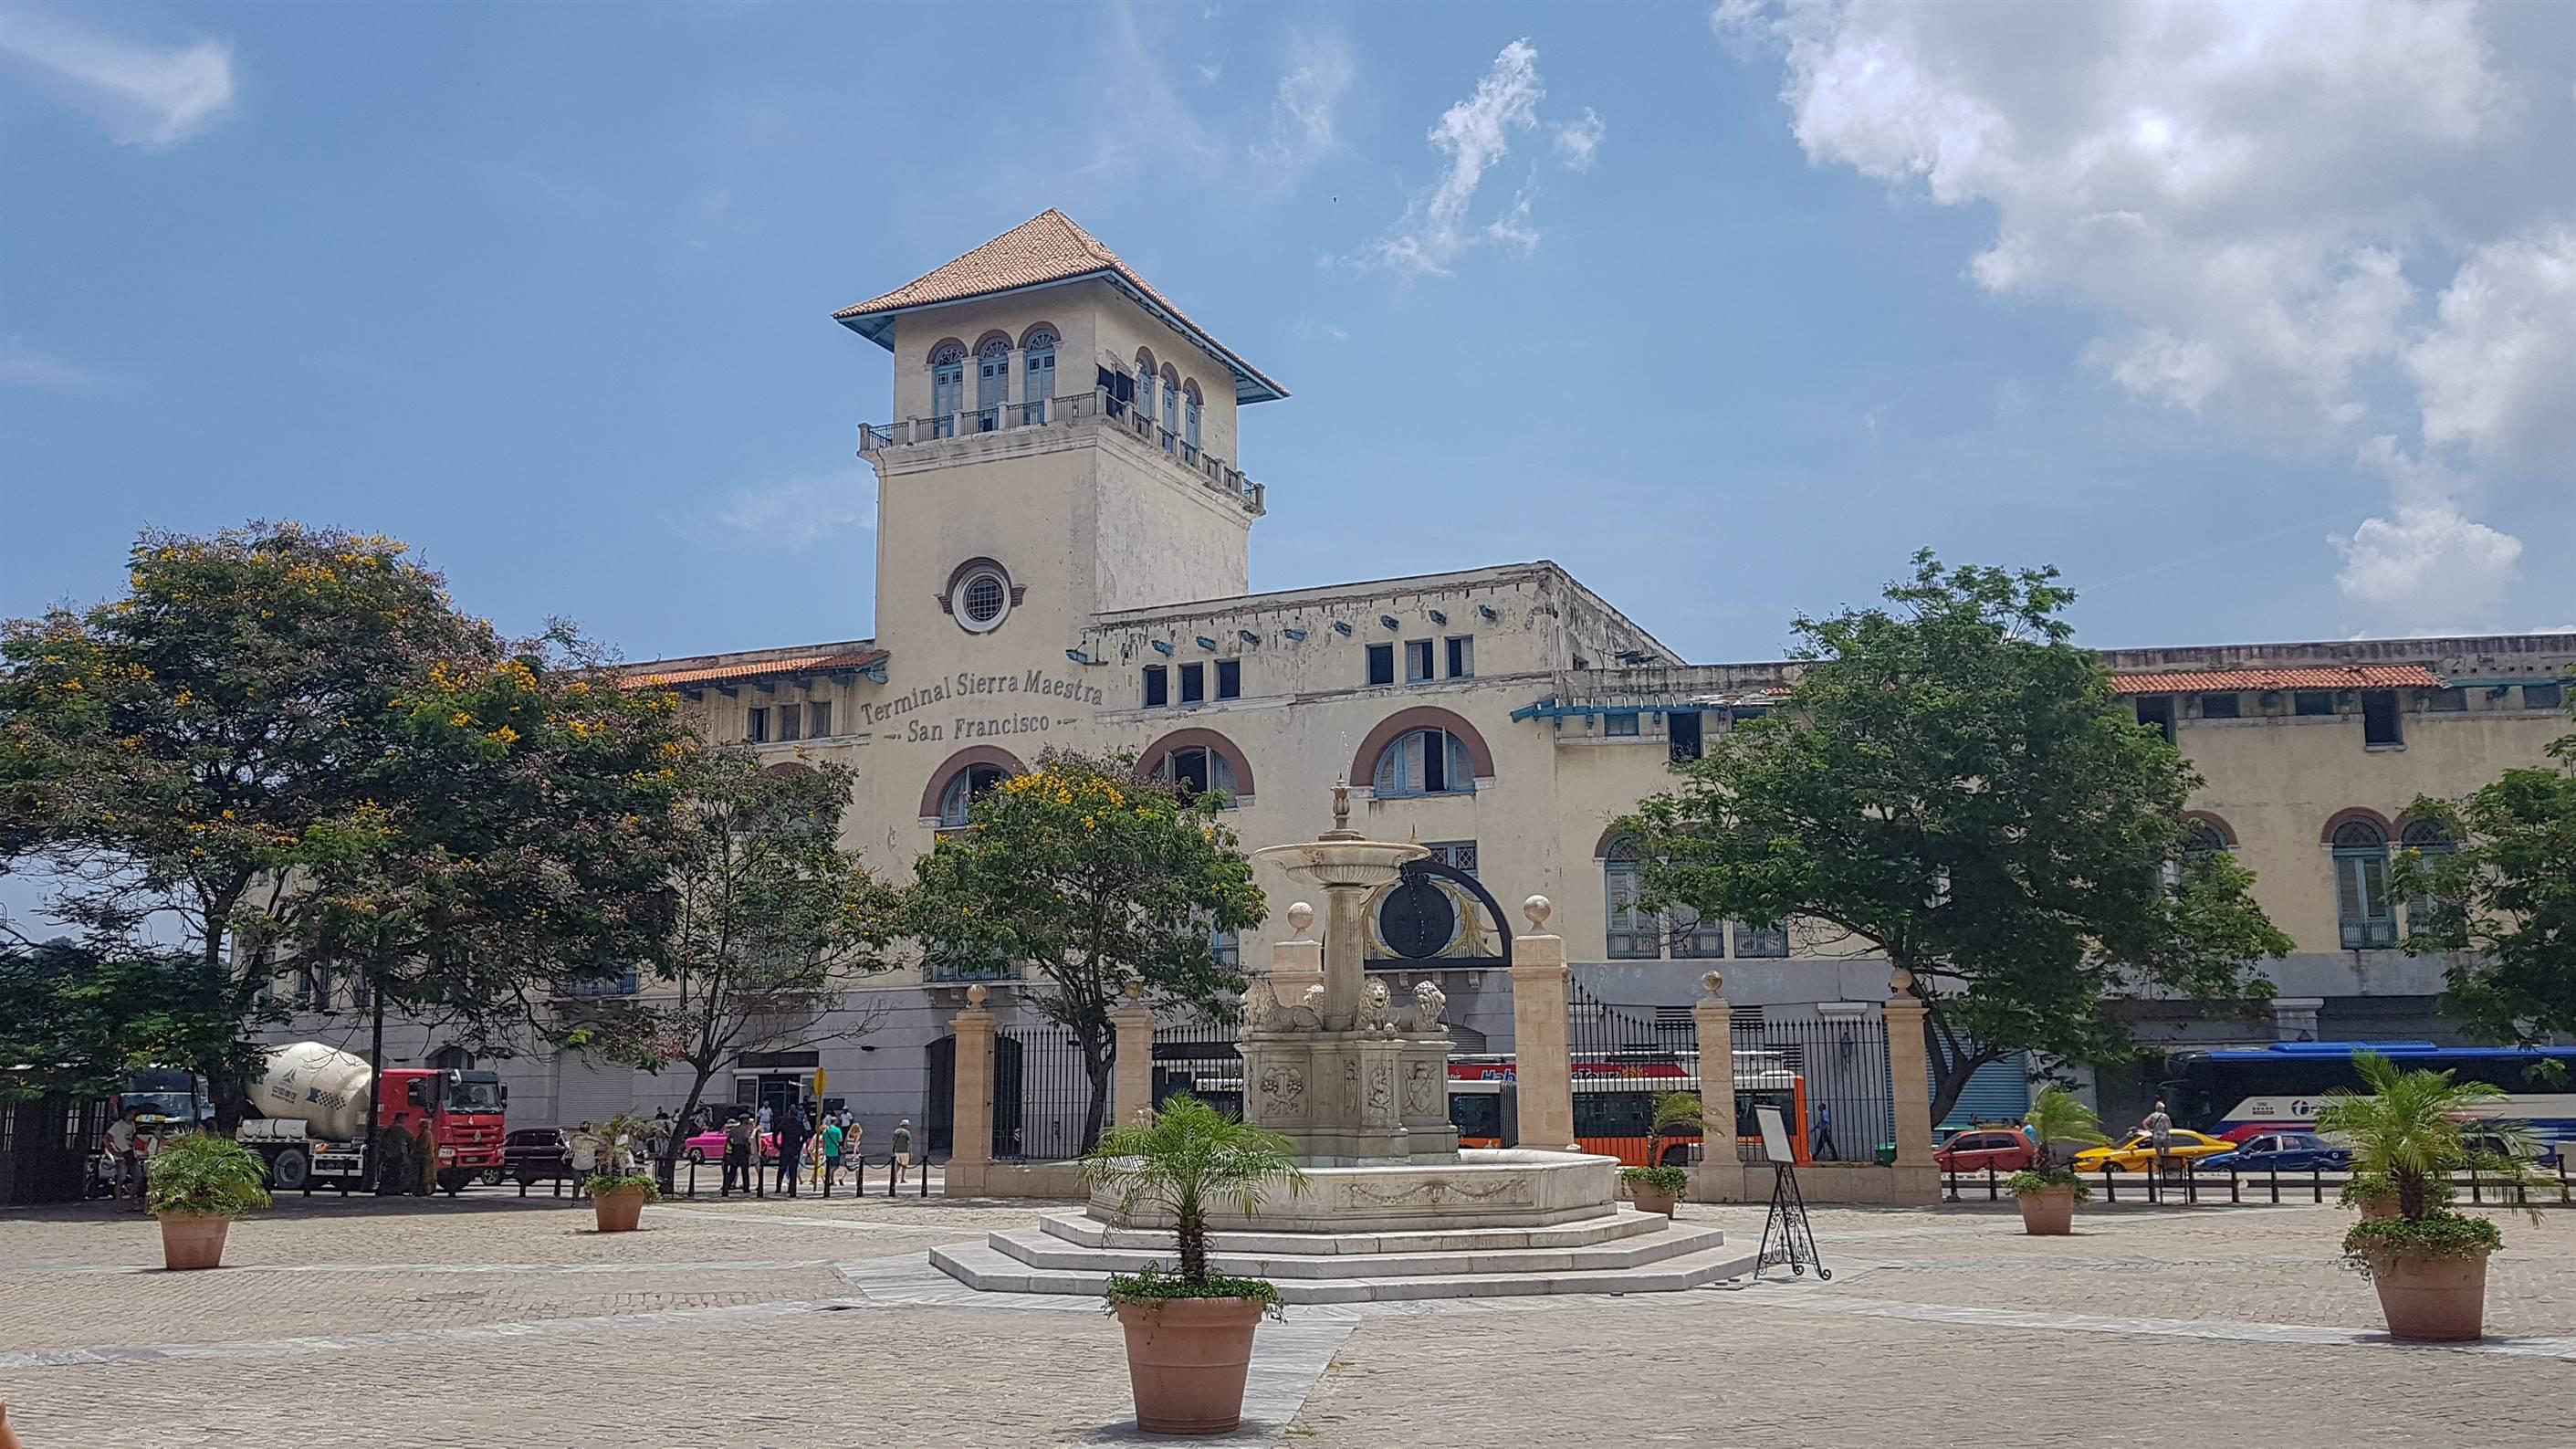 Plazza Iglesia y Covento San Fransisco de Asis, La Havane, Cuba